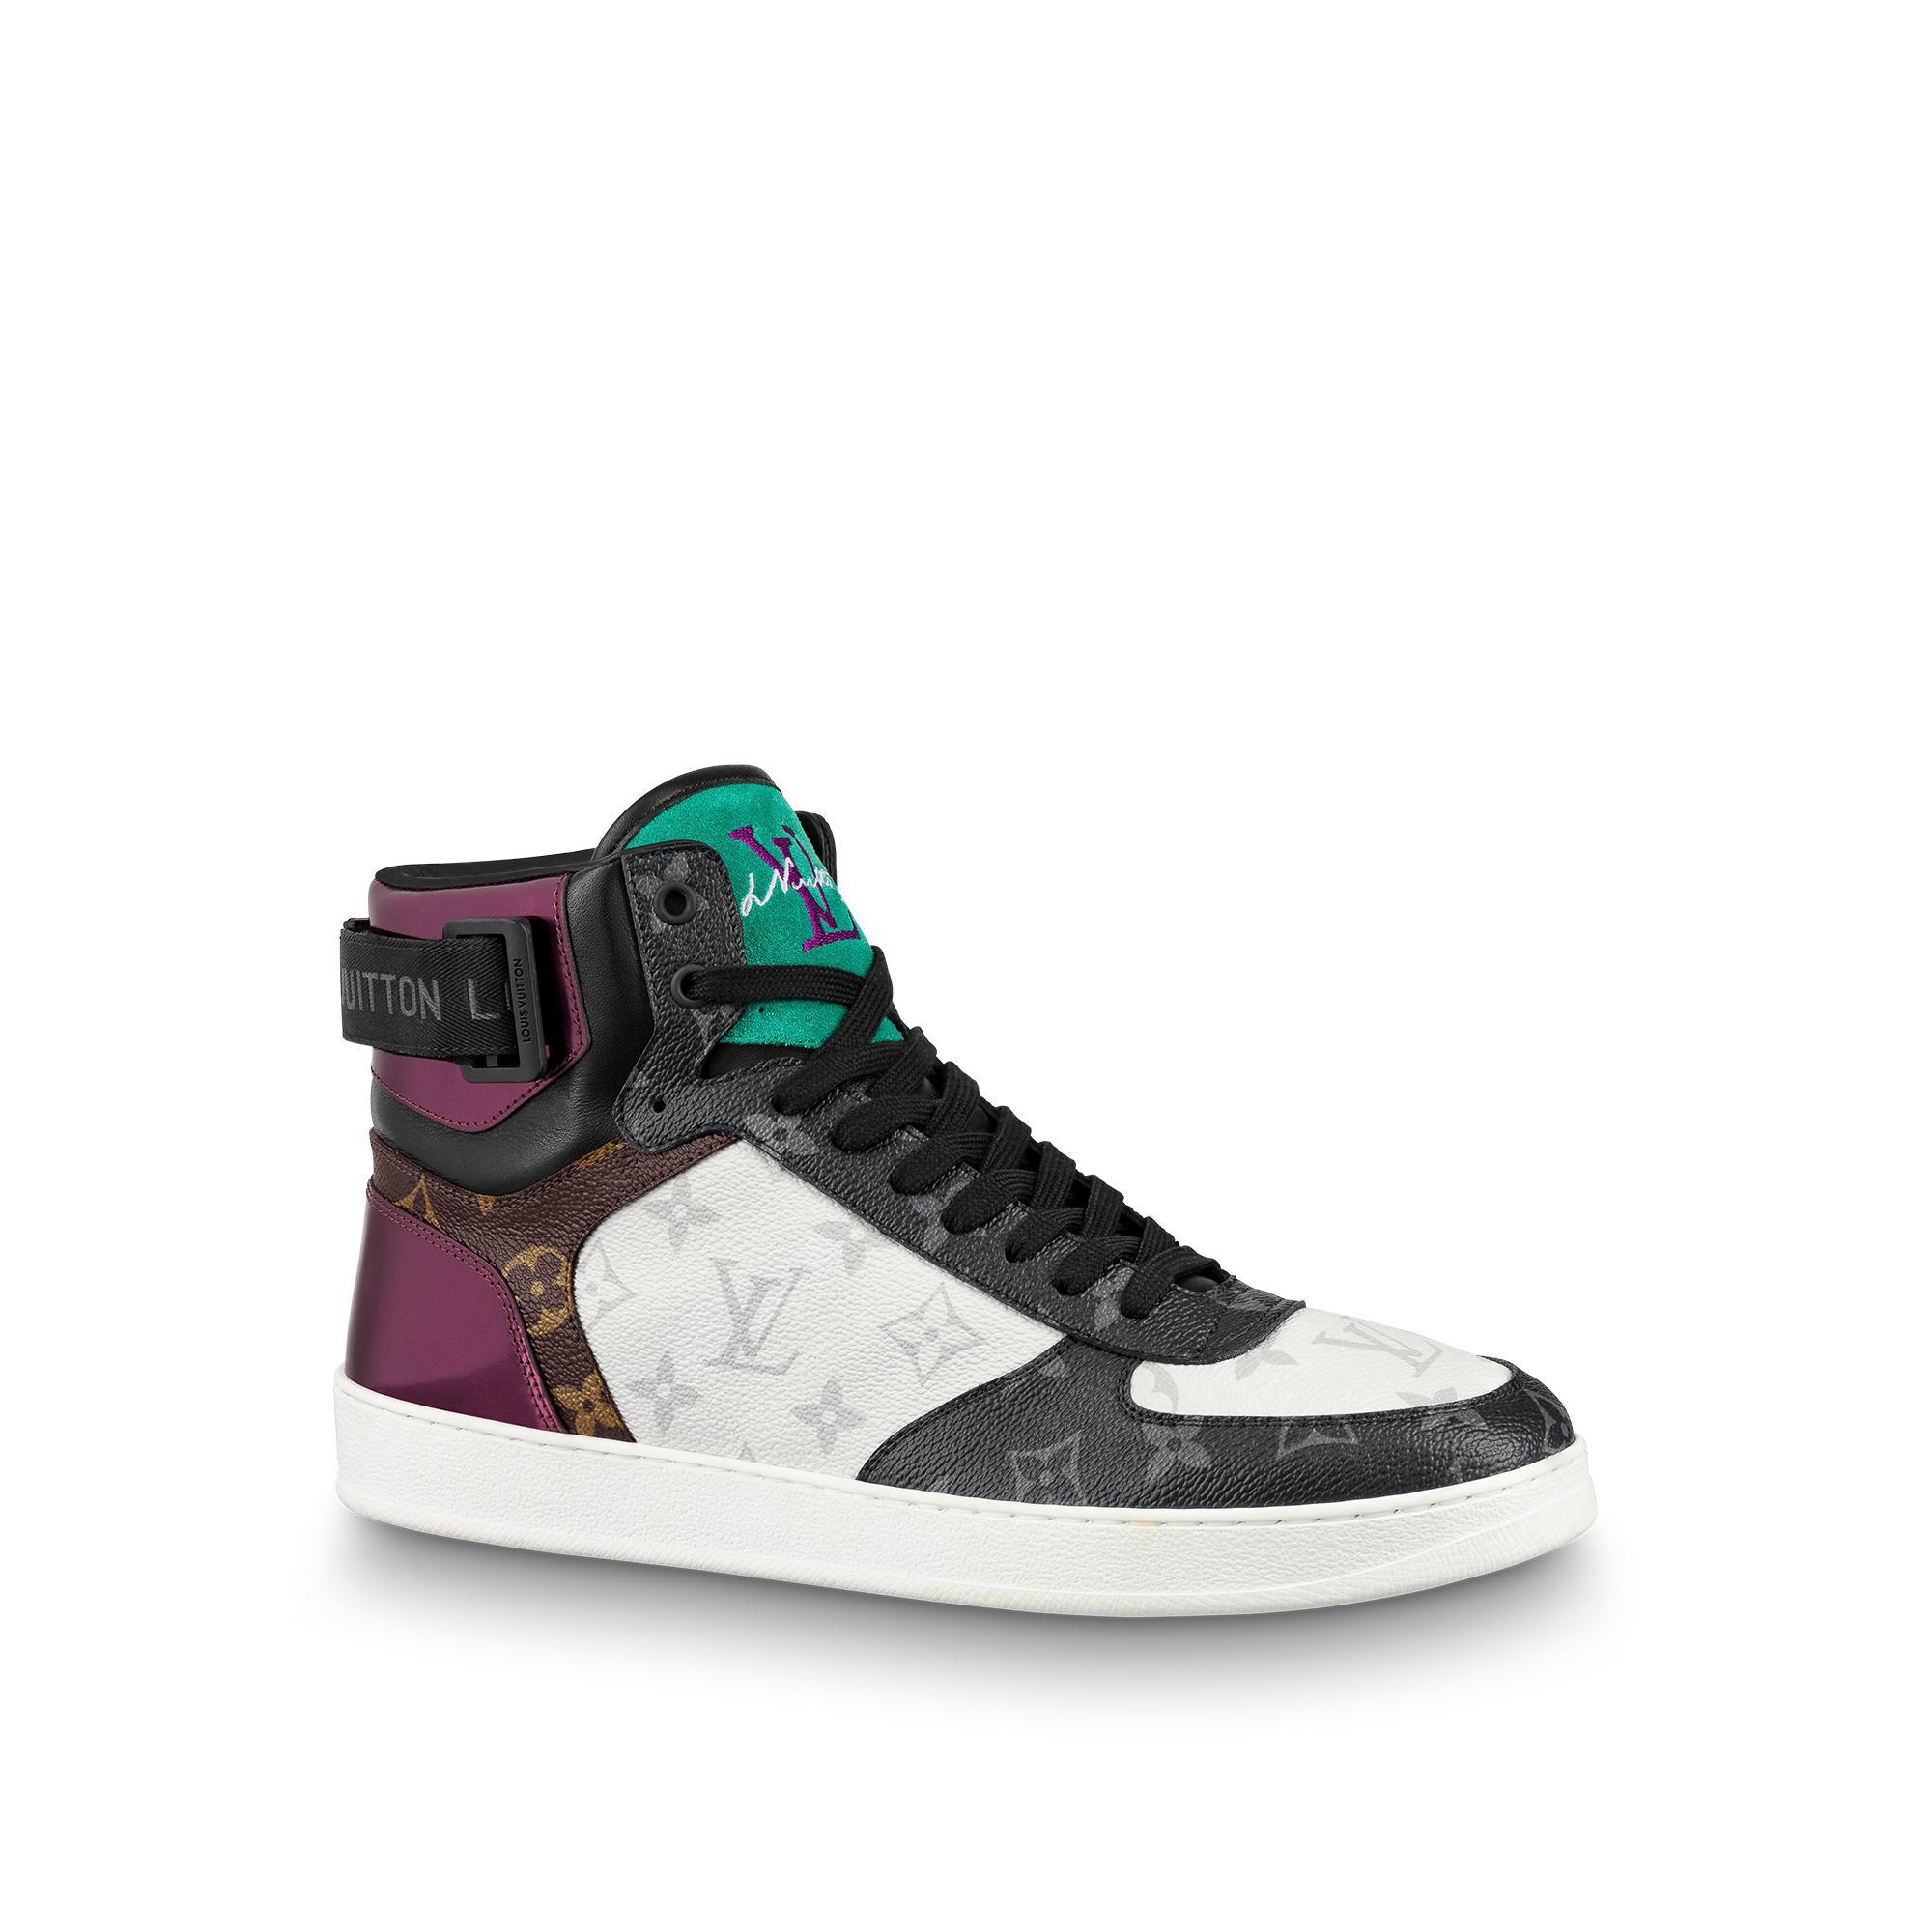 51d16fa7286e Louis Vuitton Rivoli Sneaker Boot